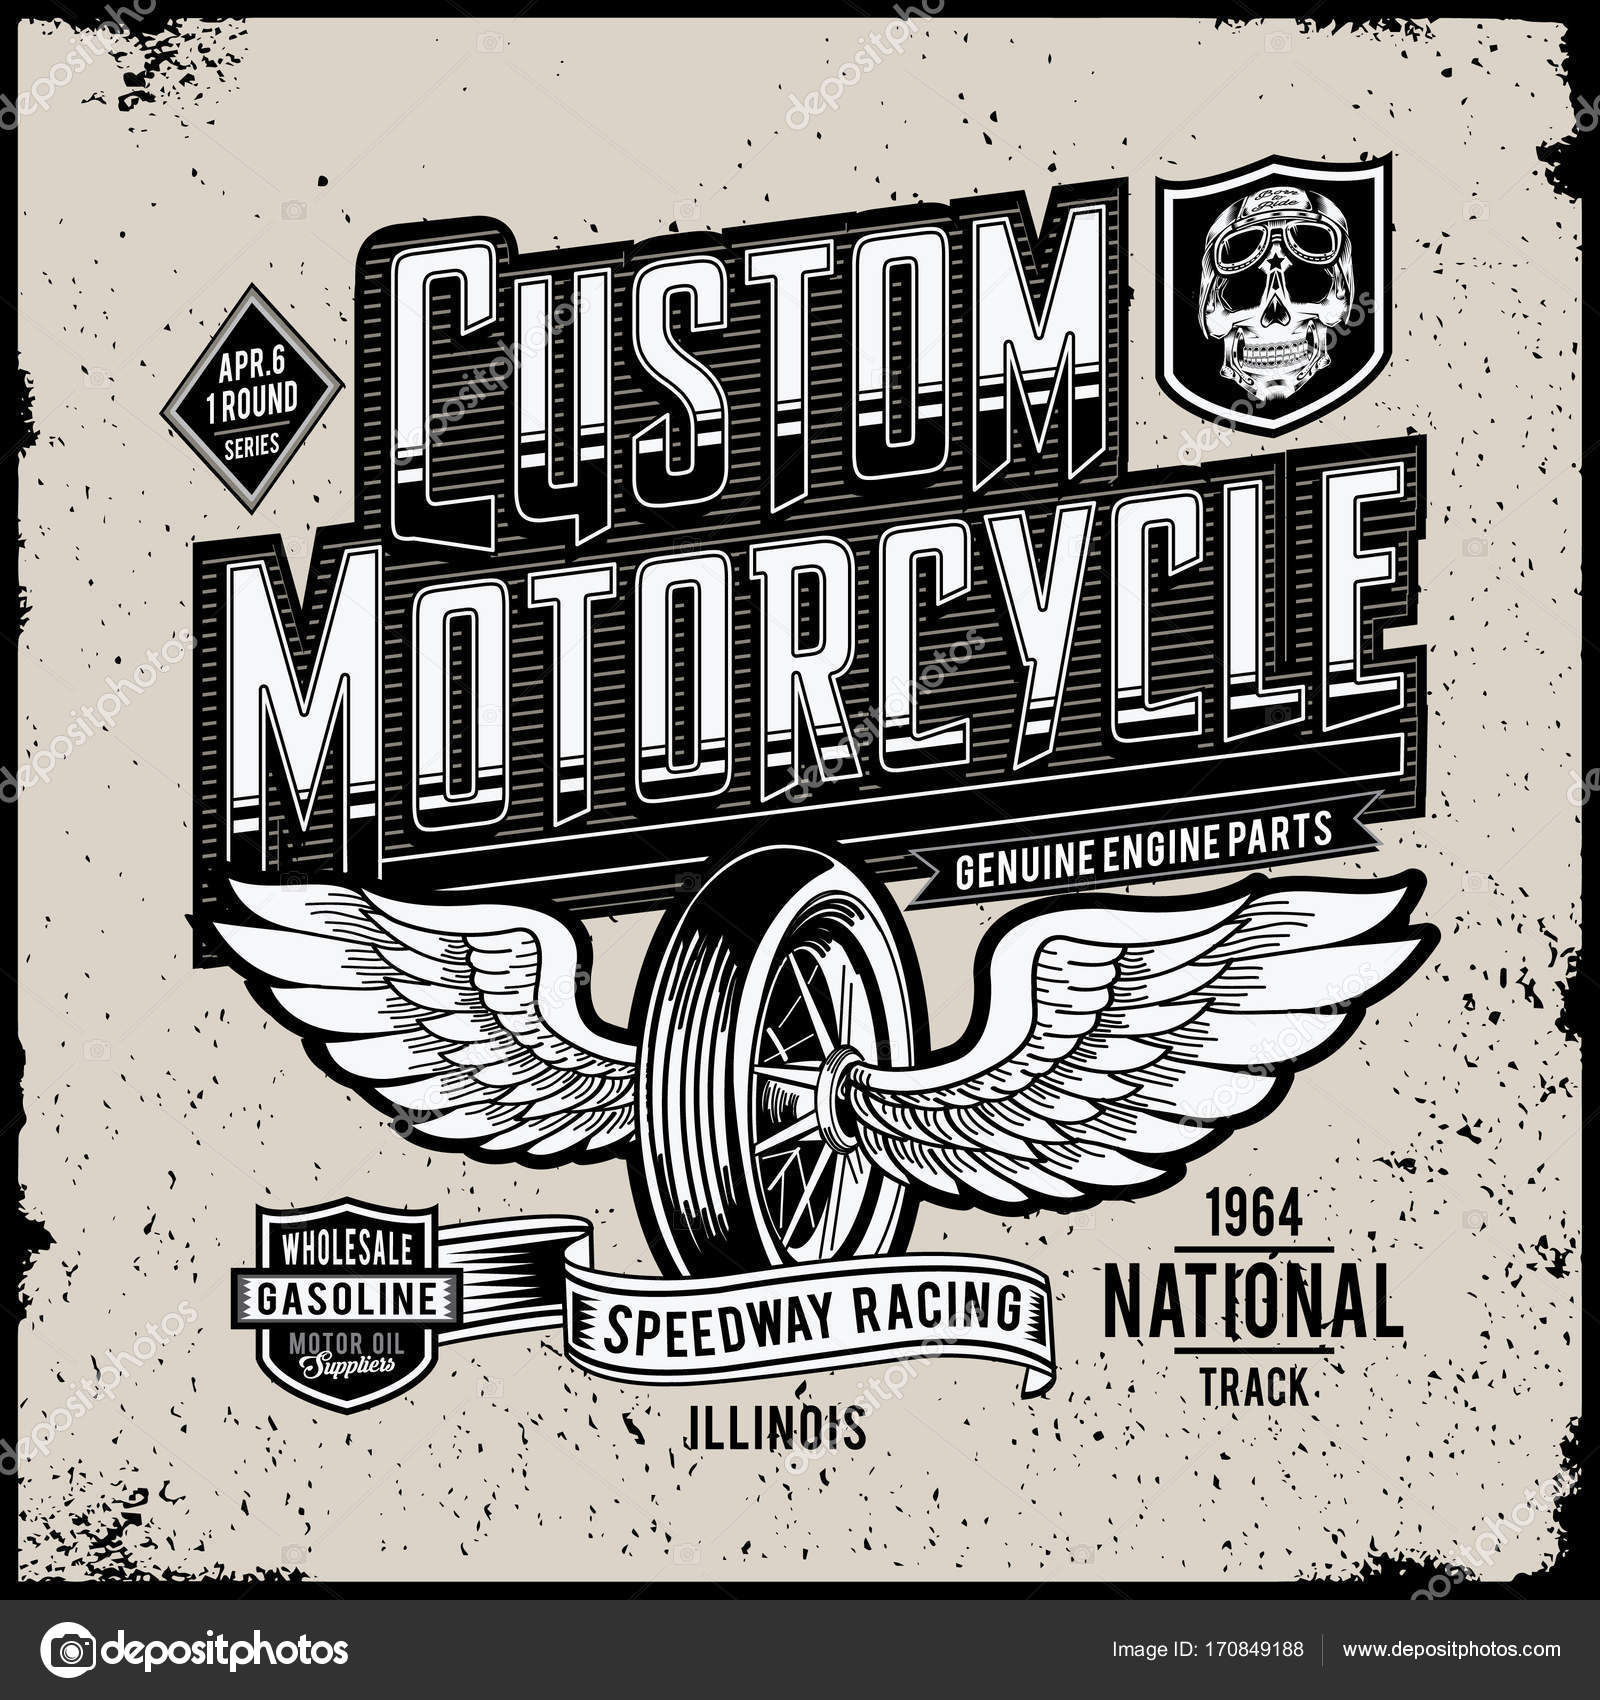 Grunge Kresby Design Opravach Vlastnich Motocyklu Stock Vektor